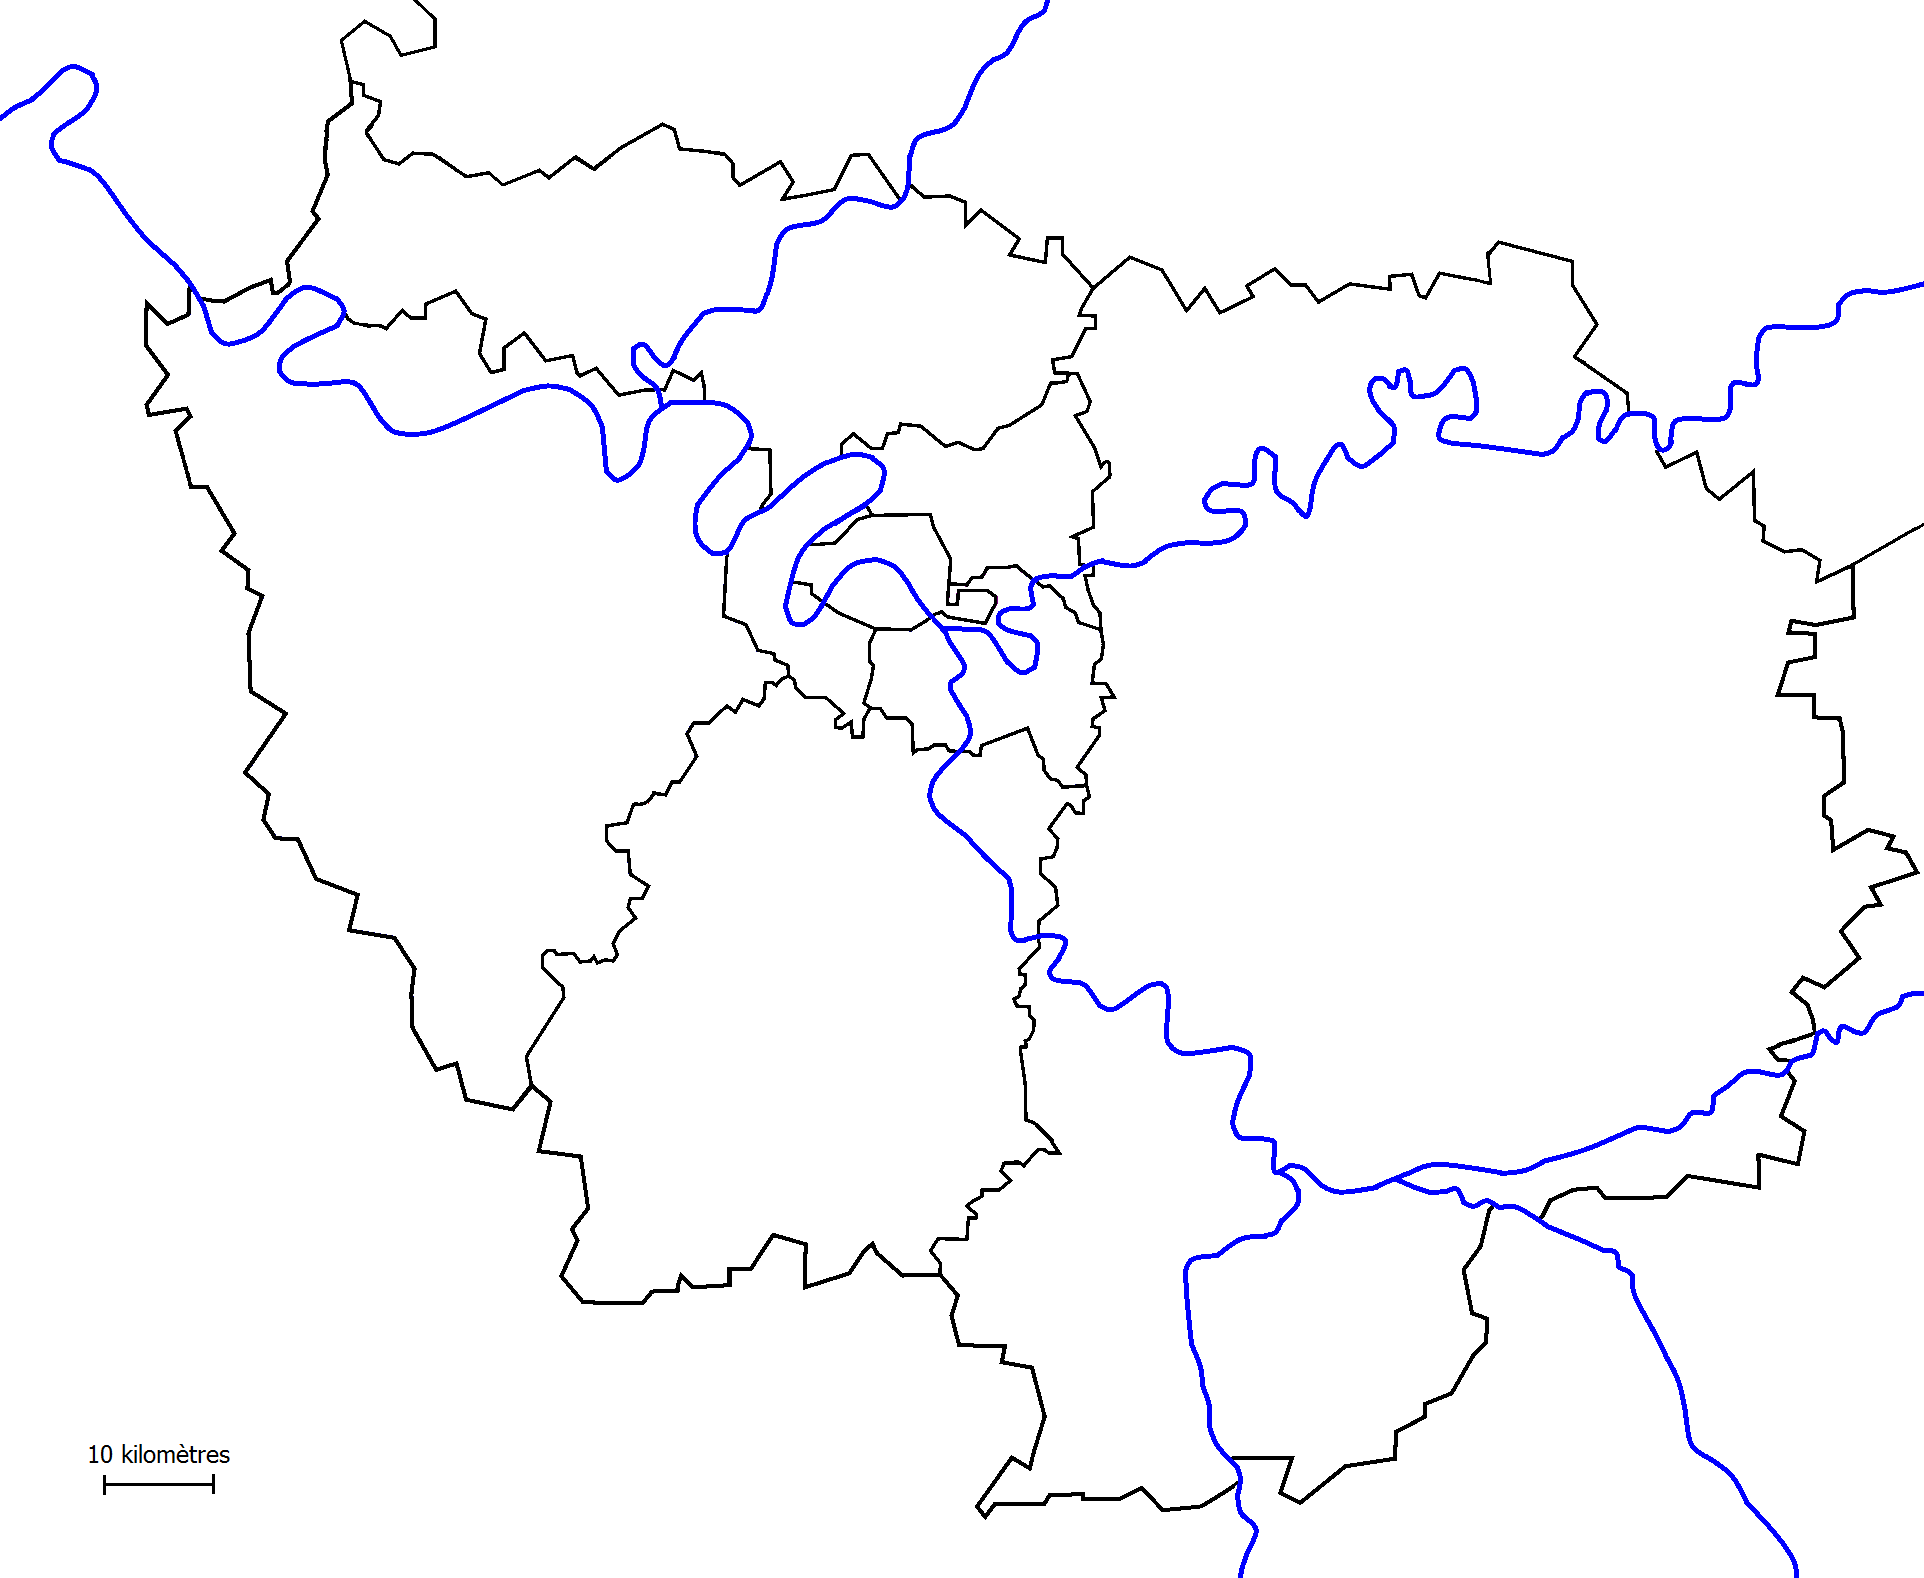 fond de carte ile de france File:Île de France (fond de carte).png   Wikimedia Commons